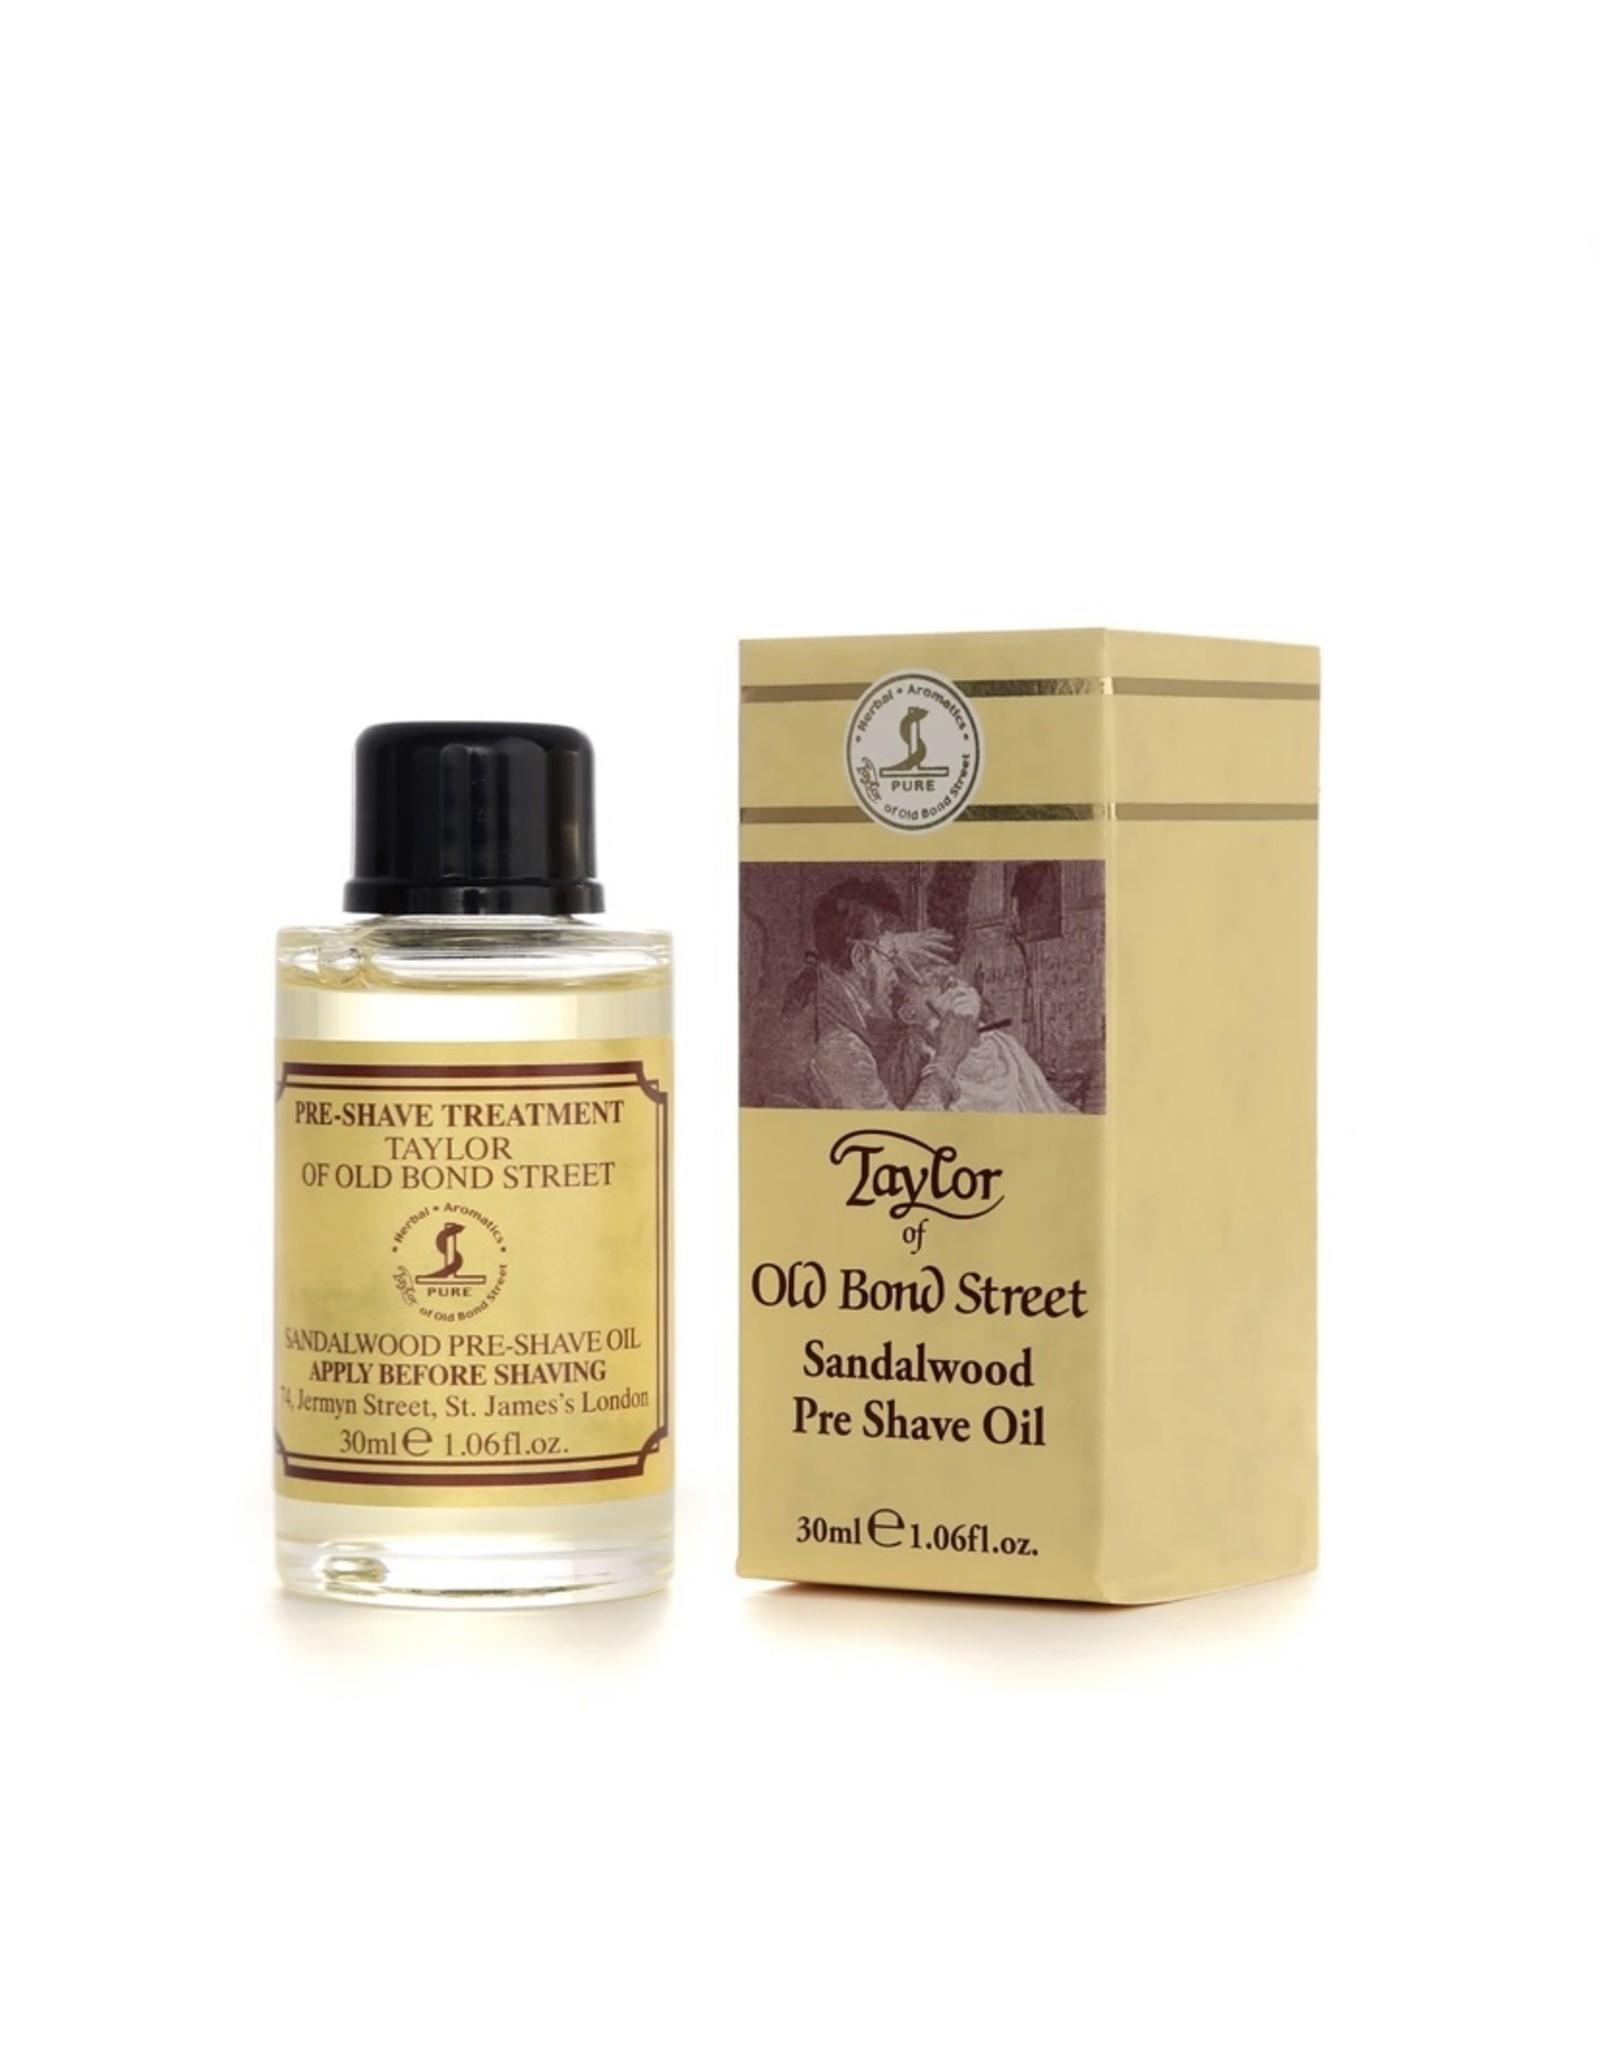 Sandalwood Pre Shave Oil, 30ml